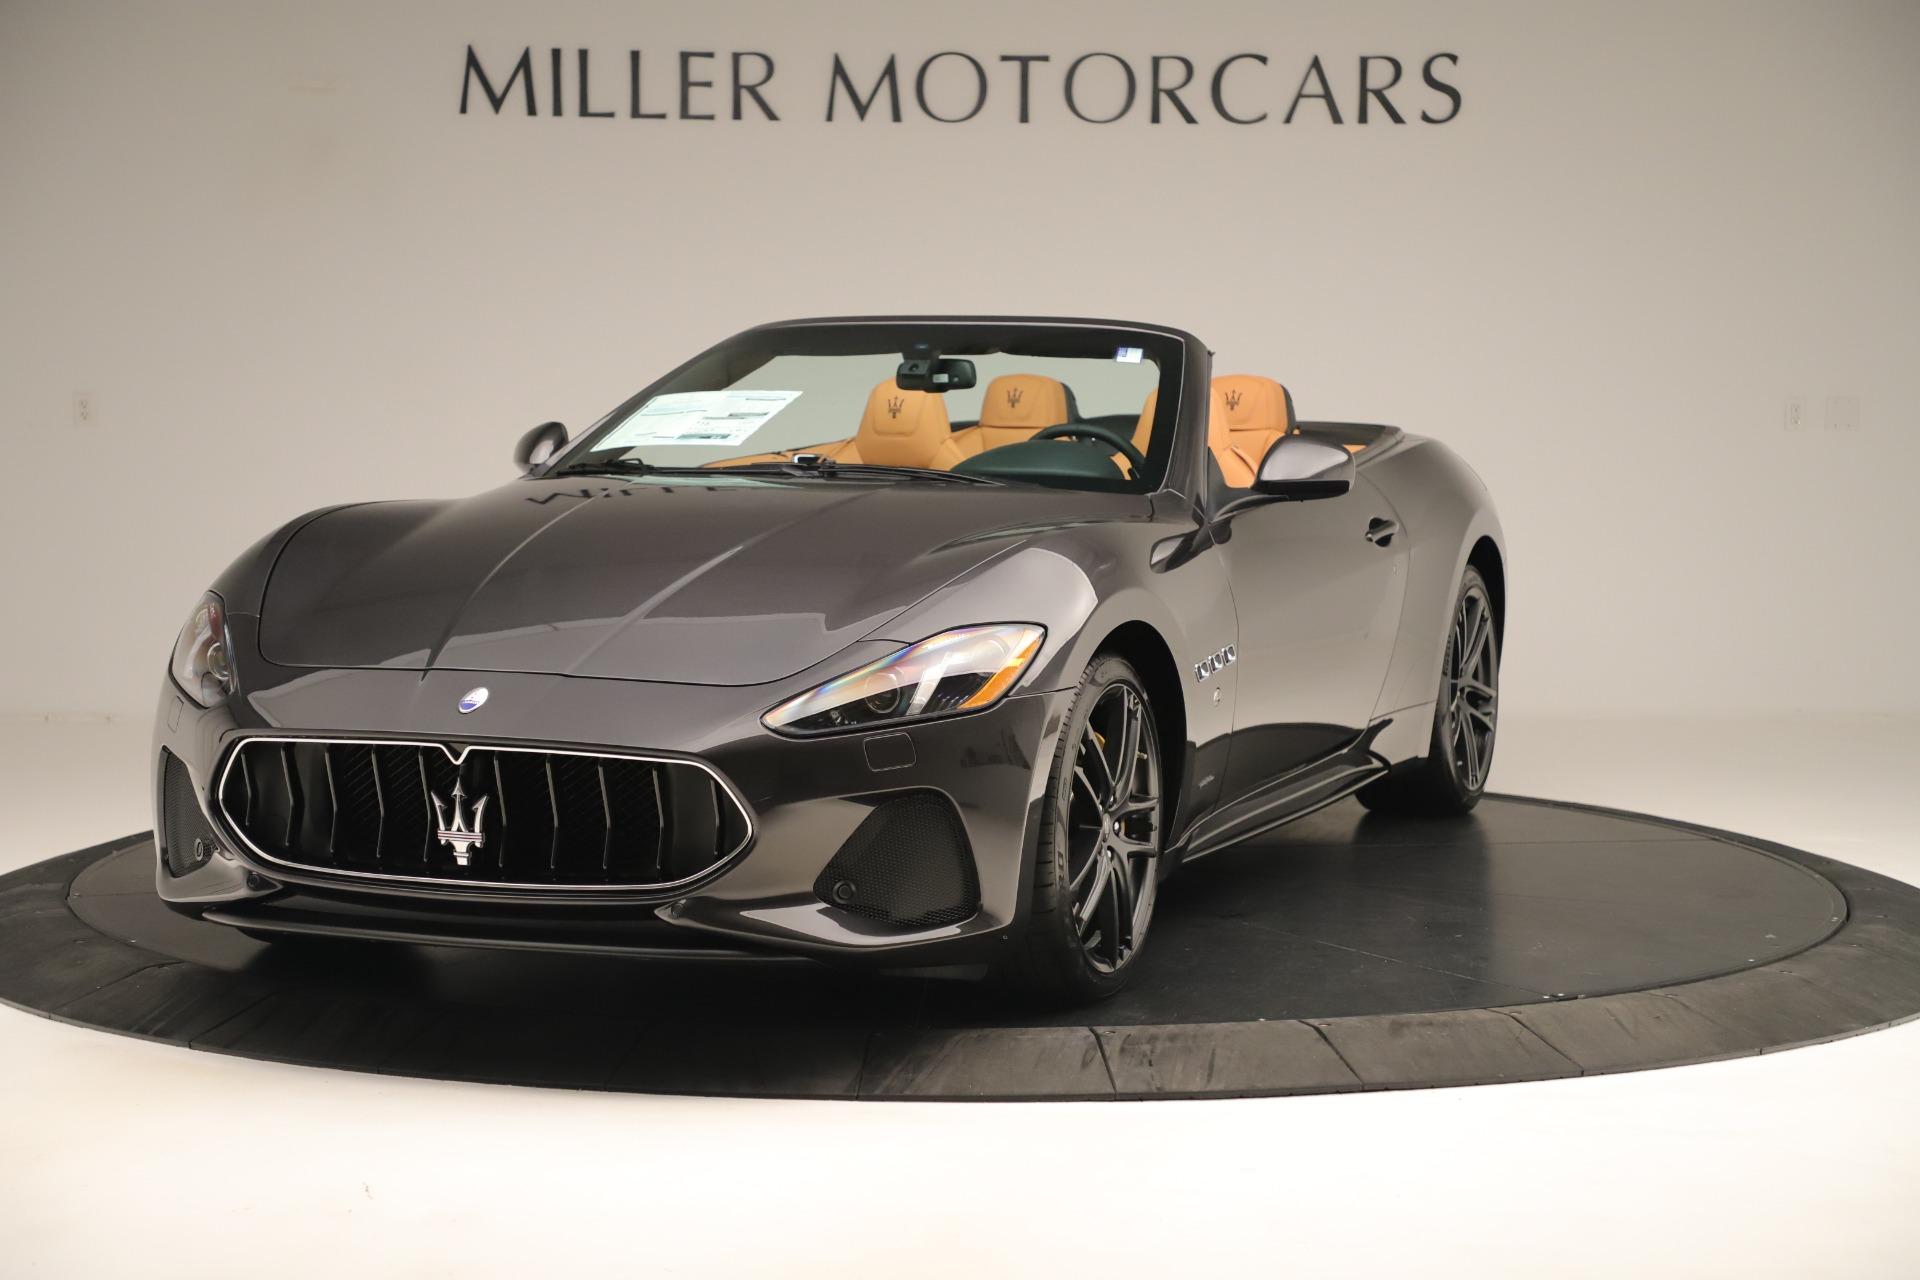 New 2019 Maserati GranTurismo Sport Convertible for sale $161,695 at Rolls-Royce Motor Cars Greenwich in Greenwich CT 06830 1